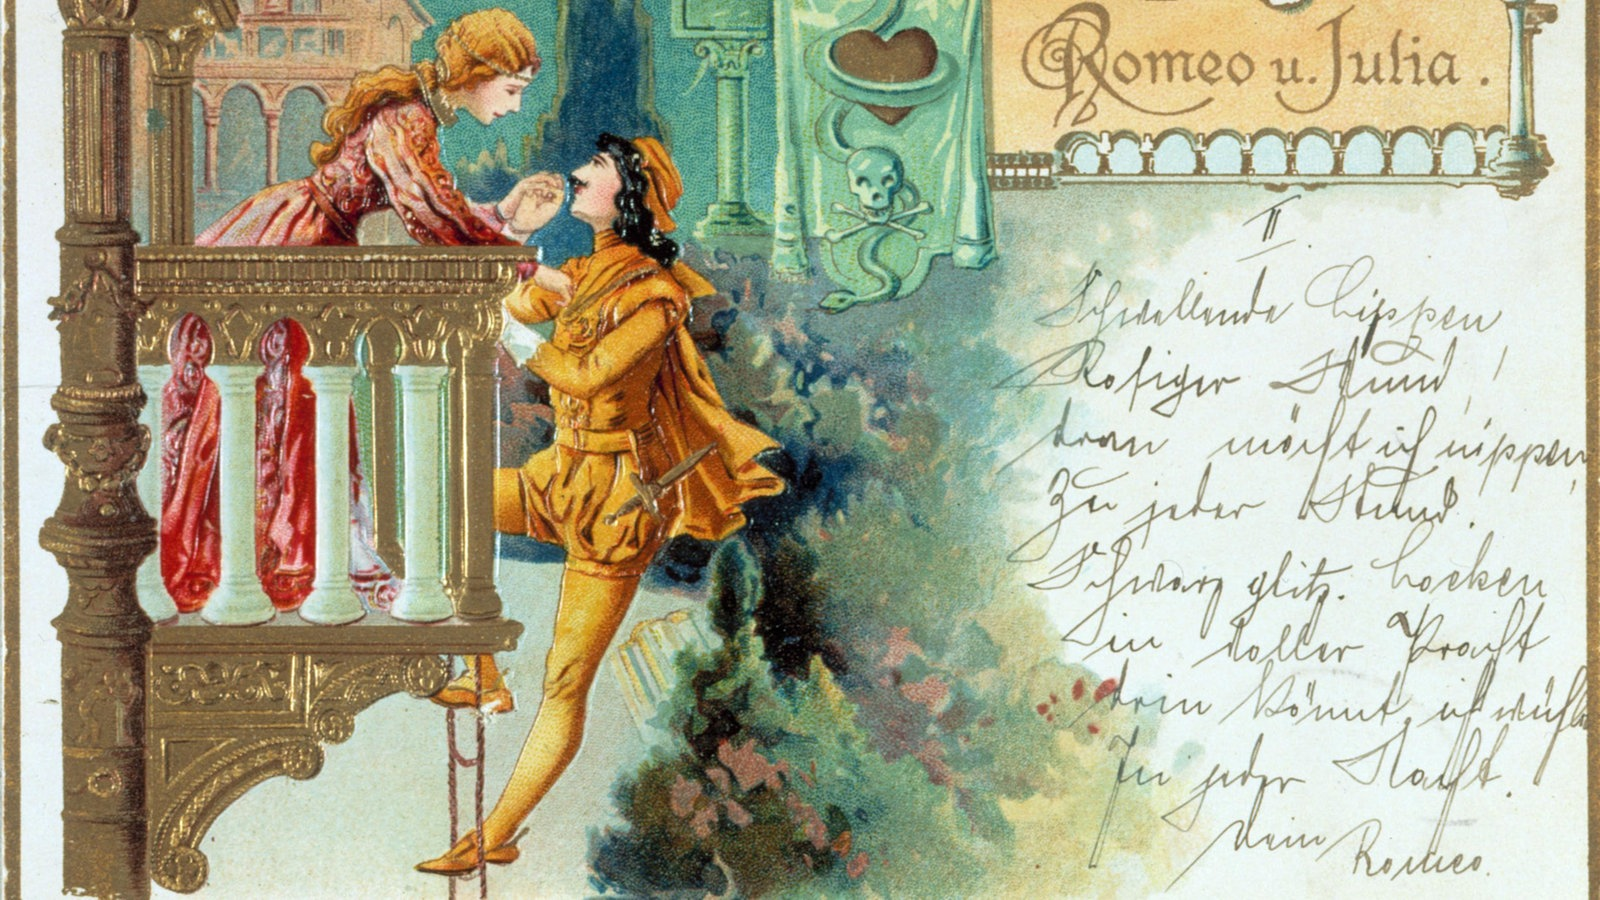 Briefe An Romeo Und Julia : Konflikte berühmte kommunikation